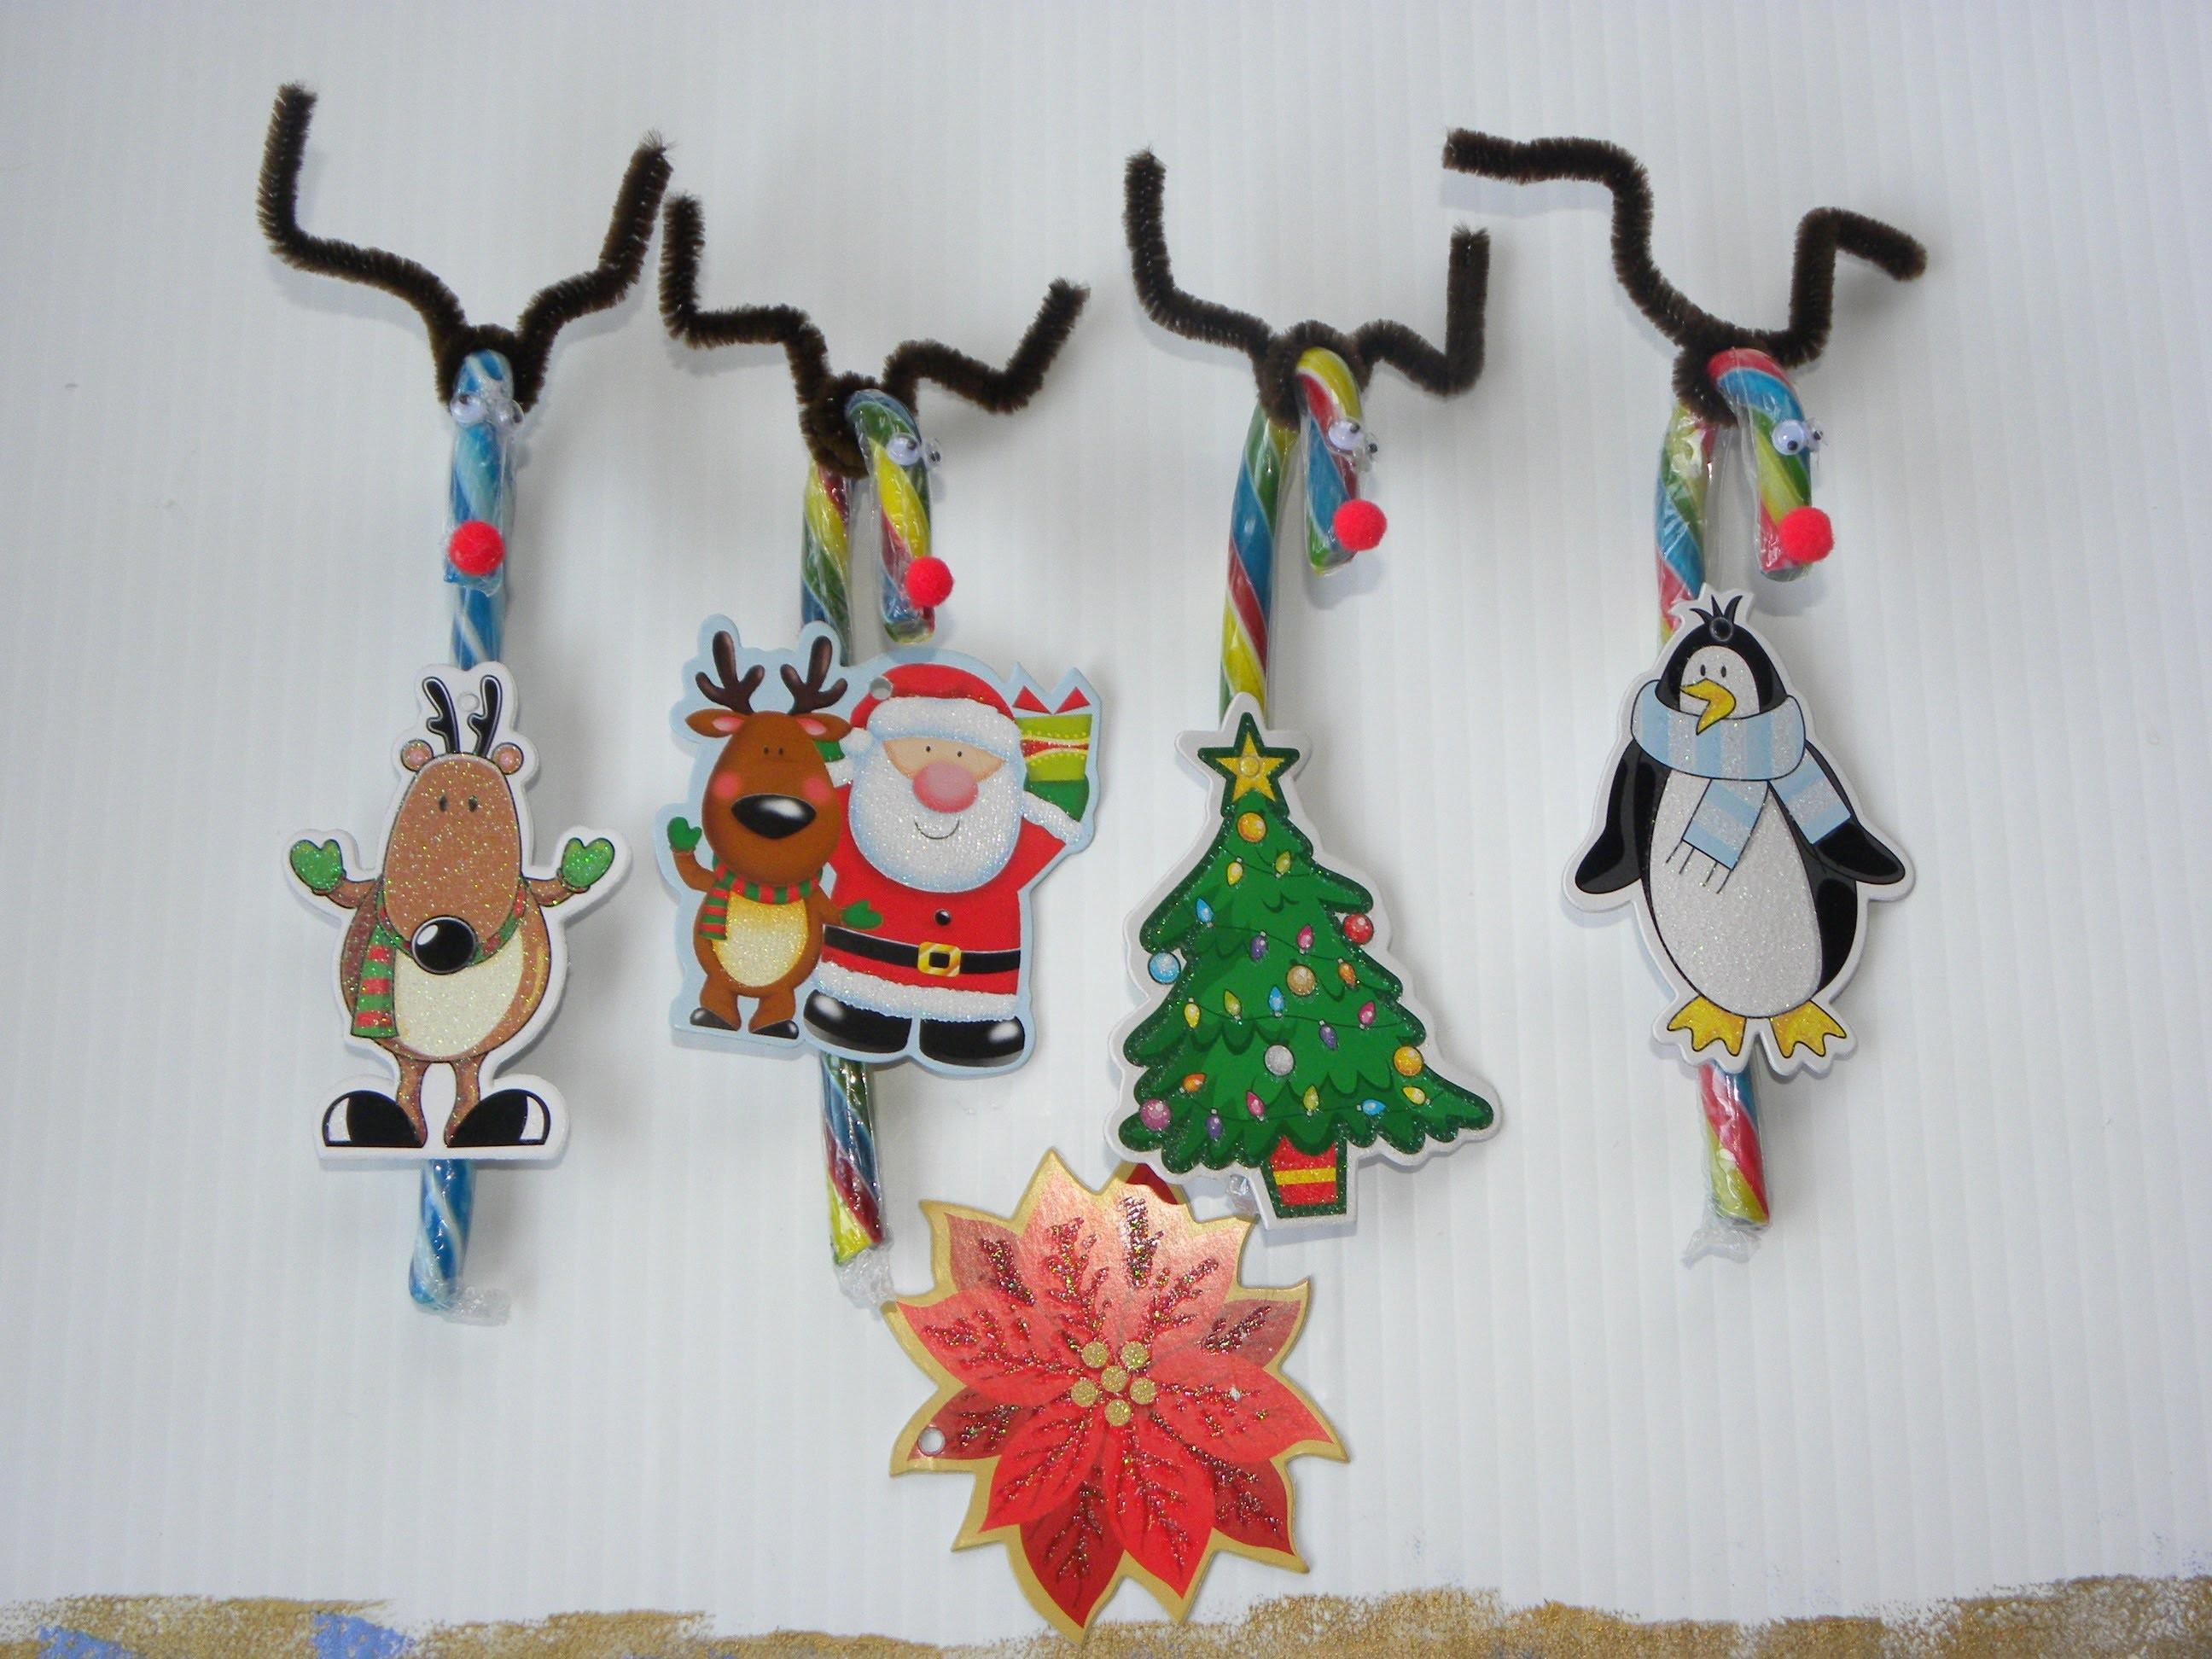 Renos Navideños de caramelo  .- Candy Cane Reindeers